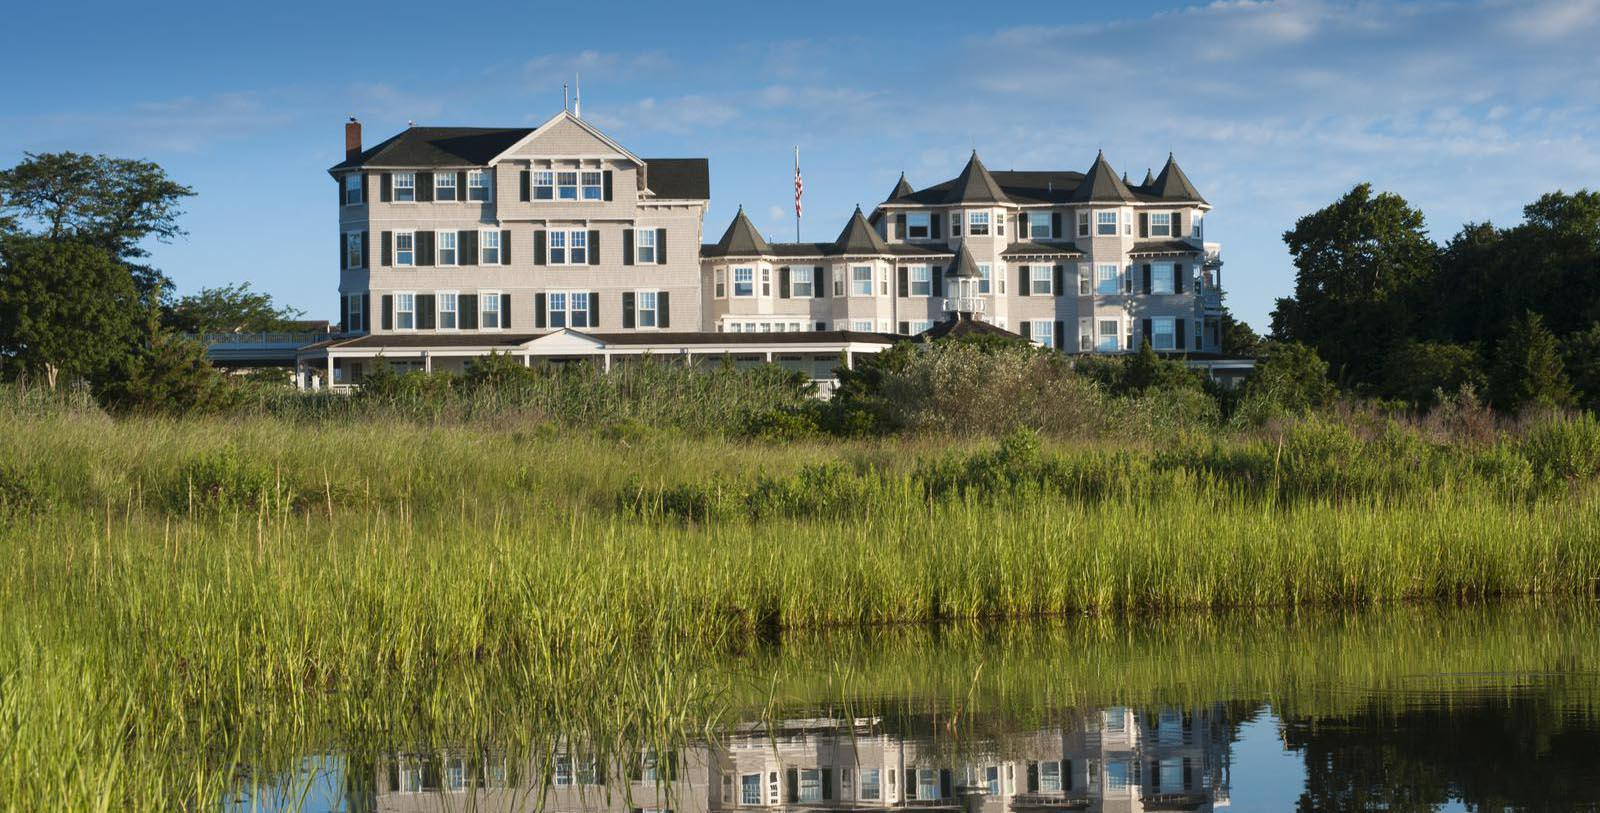 Daytime exterior of the Harbor View Hotel in Edgartown, Massachusetts.